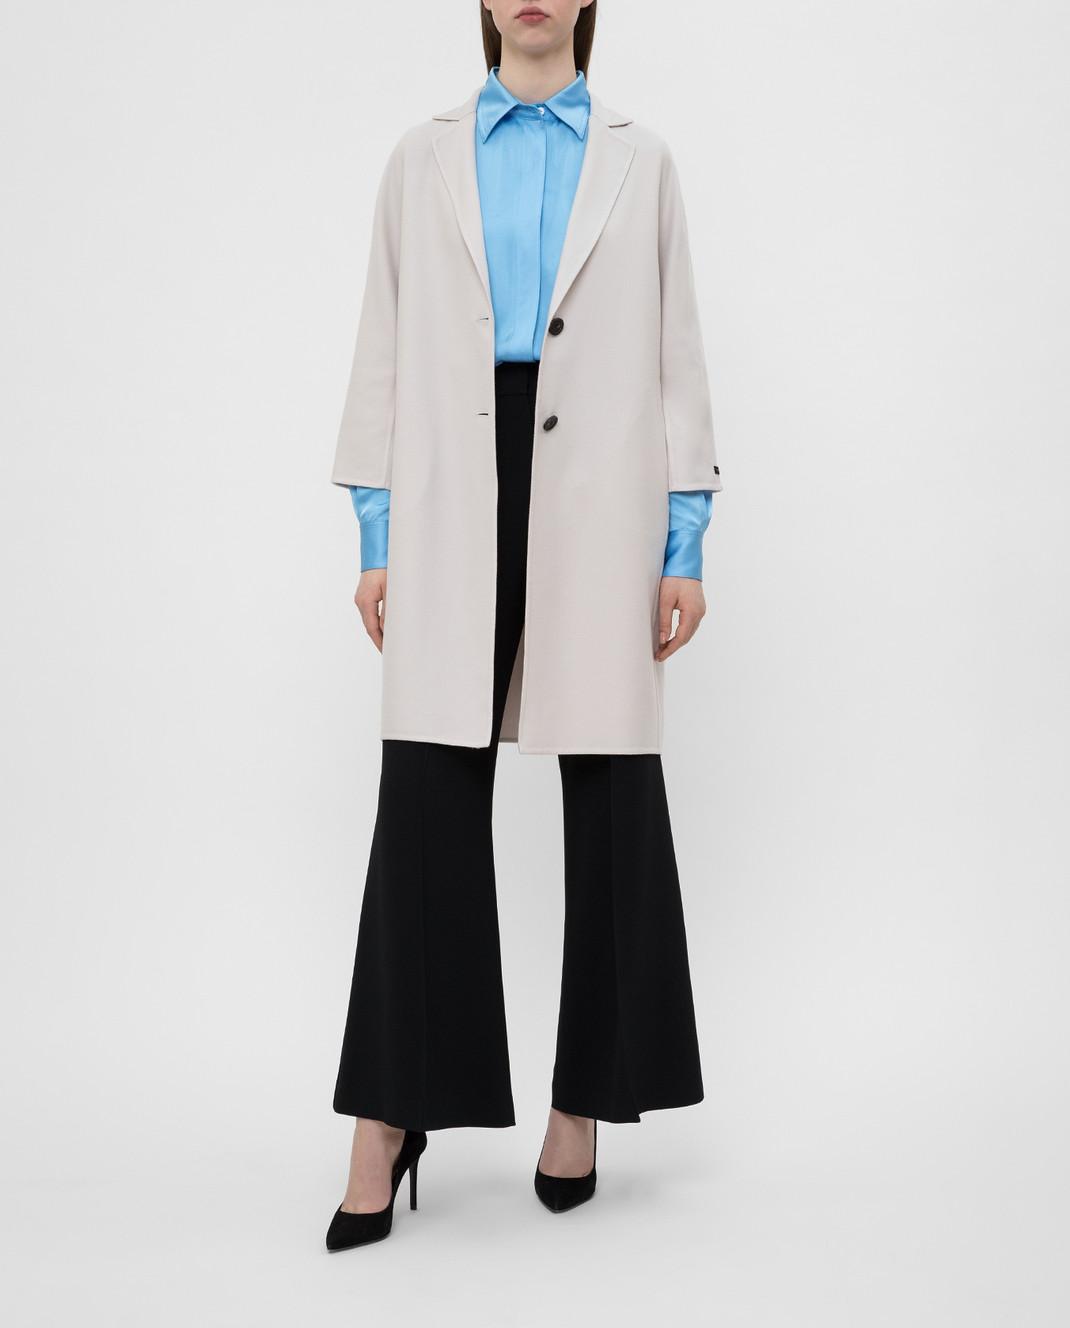 Peserico Светло-бежевое пальто из кашемира и шерсти S20493E изображение 2